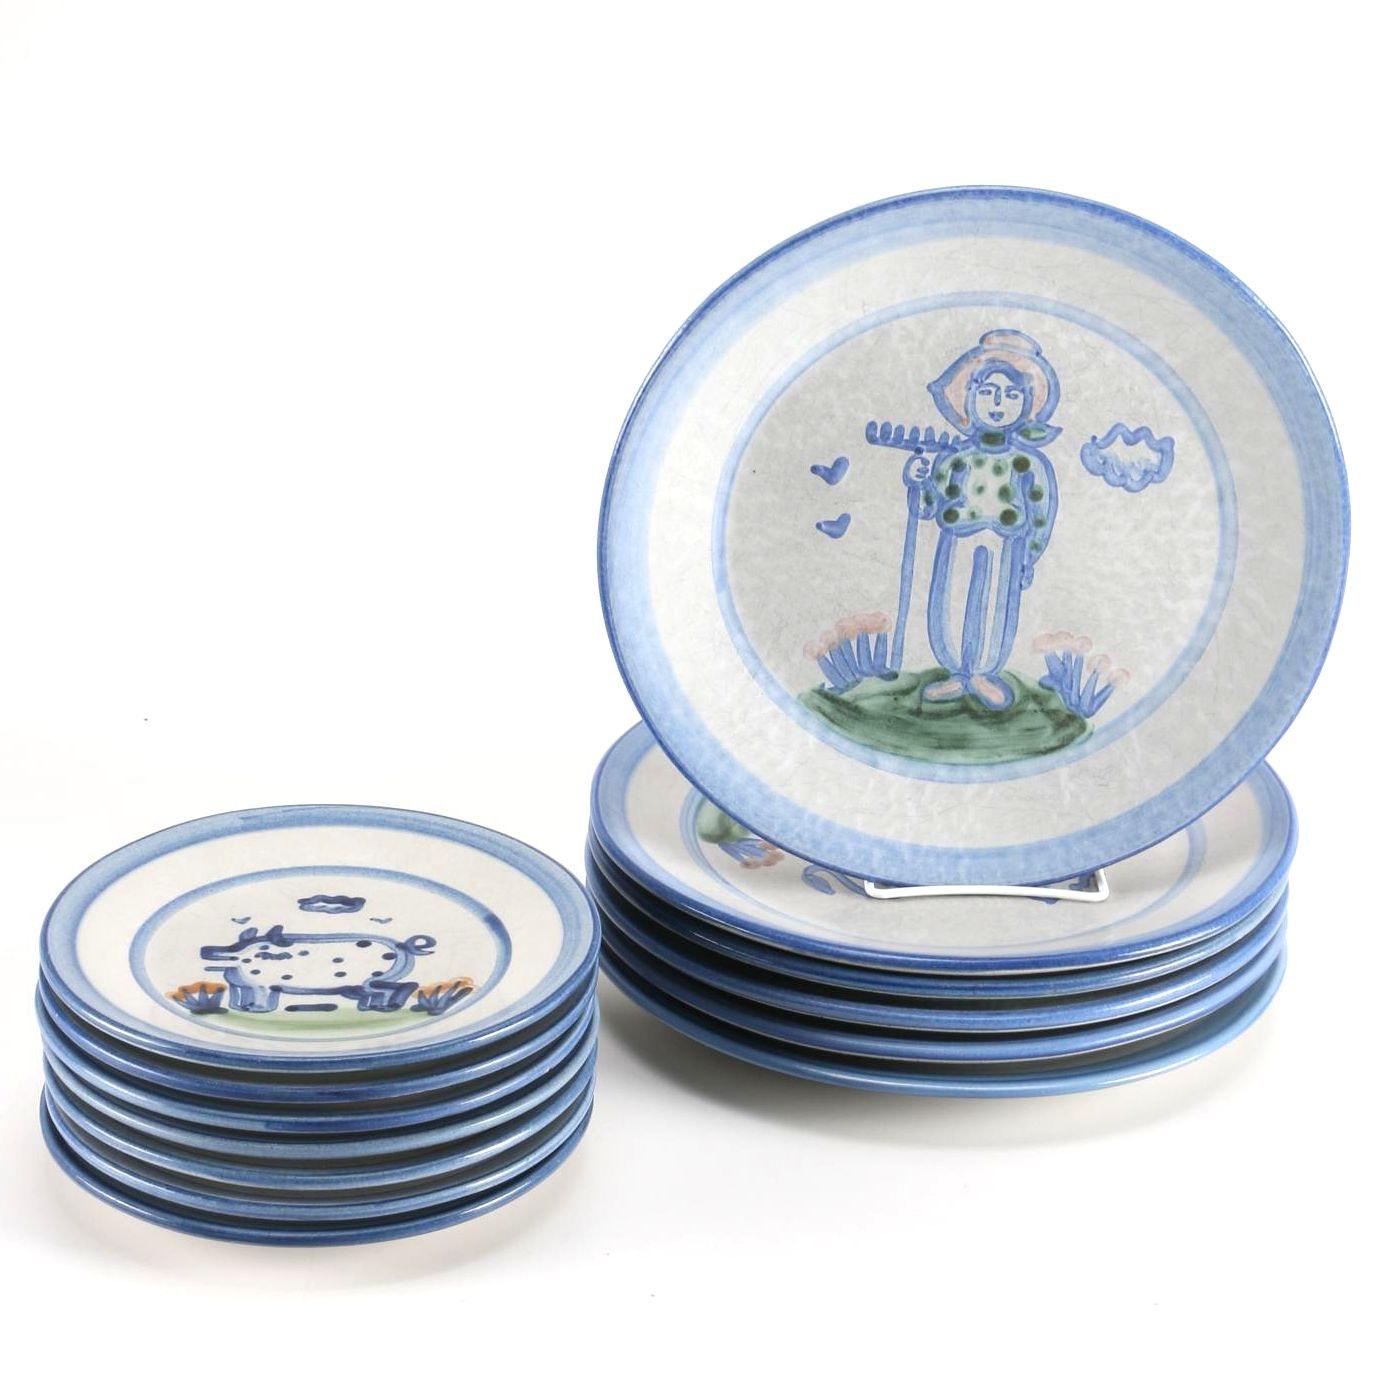 Hadley Pottery Plates